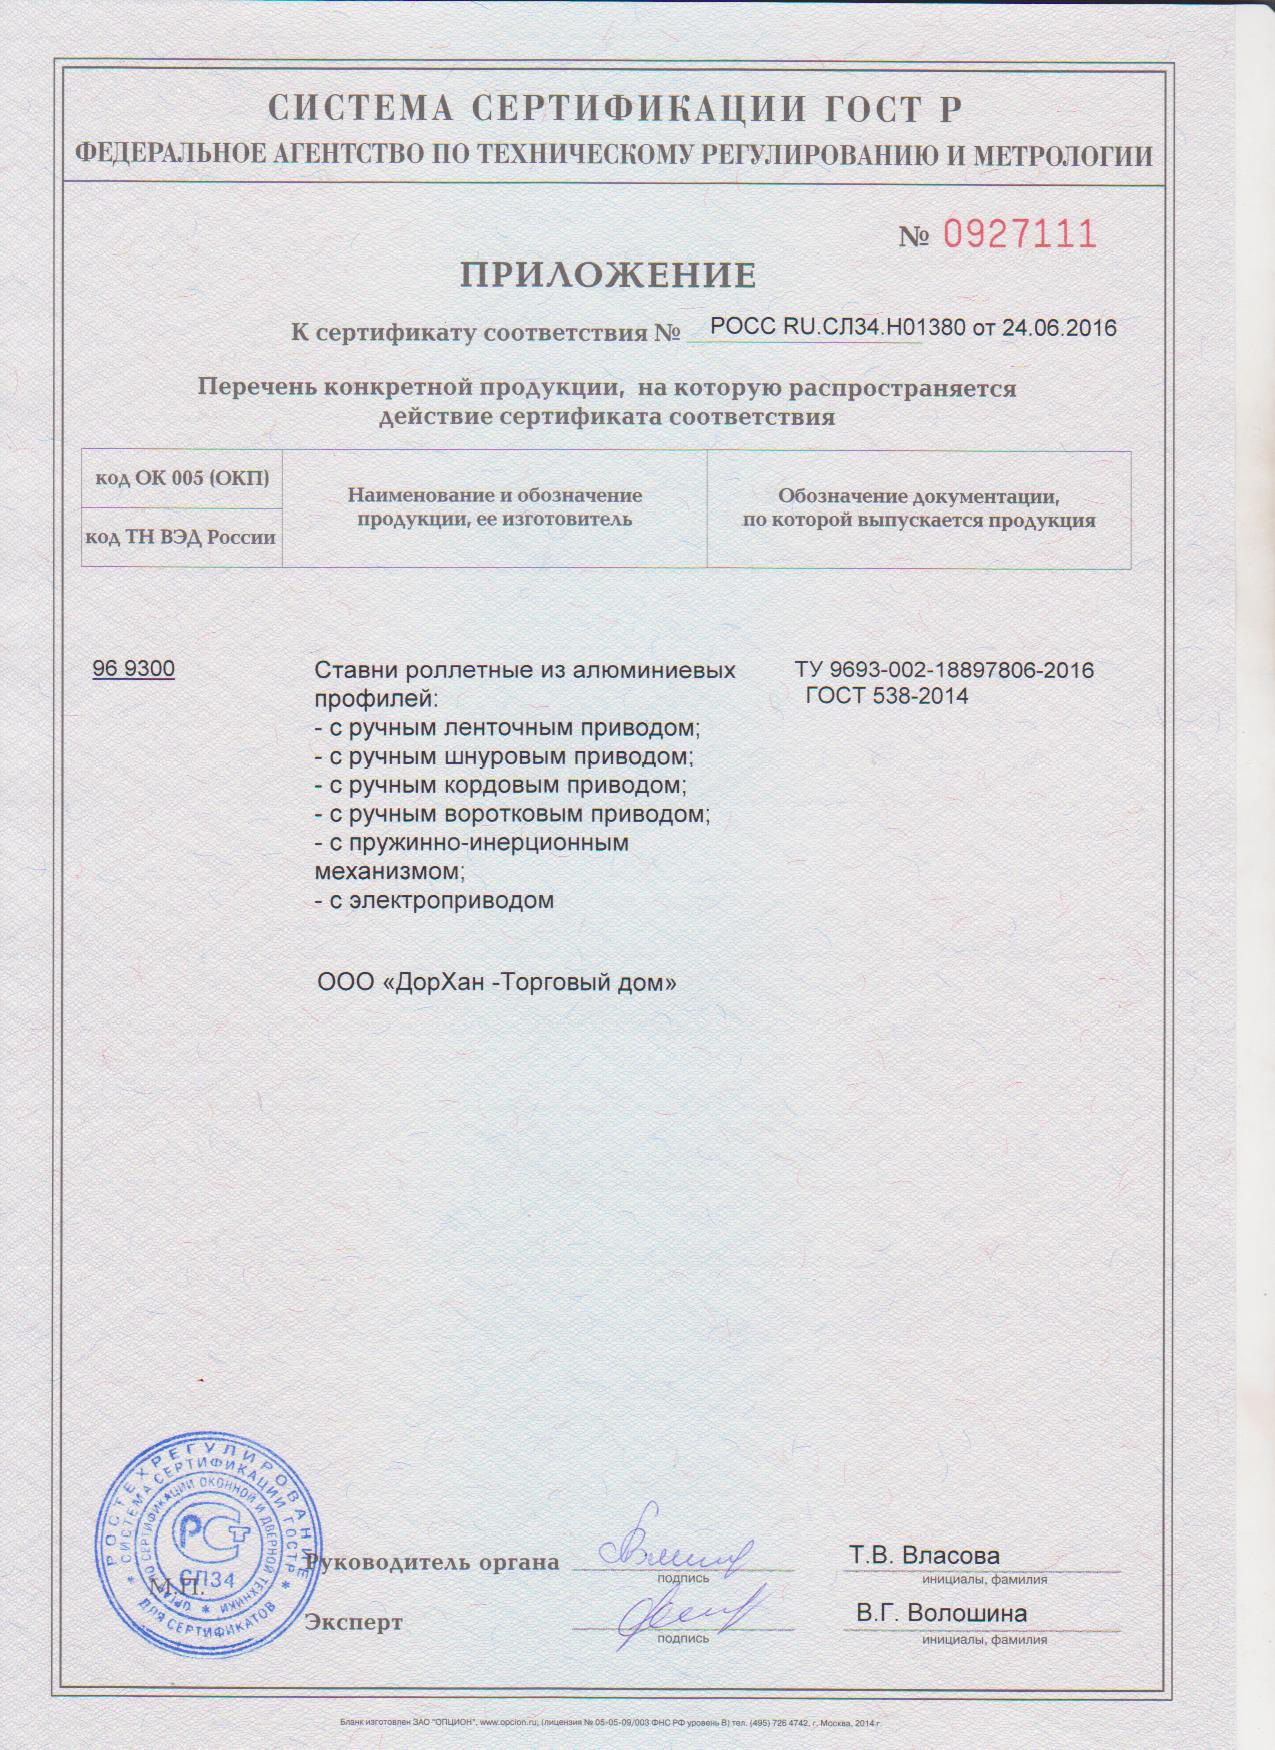 sertifikat-soodvetstviya-rolstavni-dorhan-2